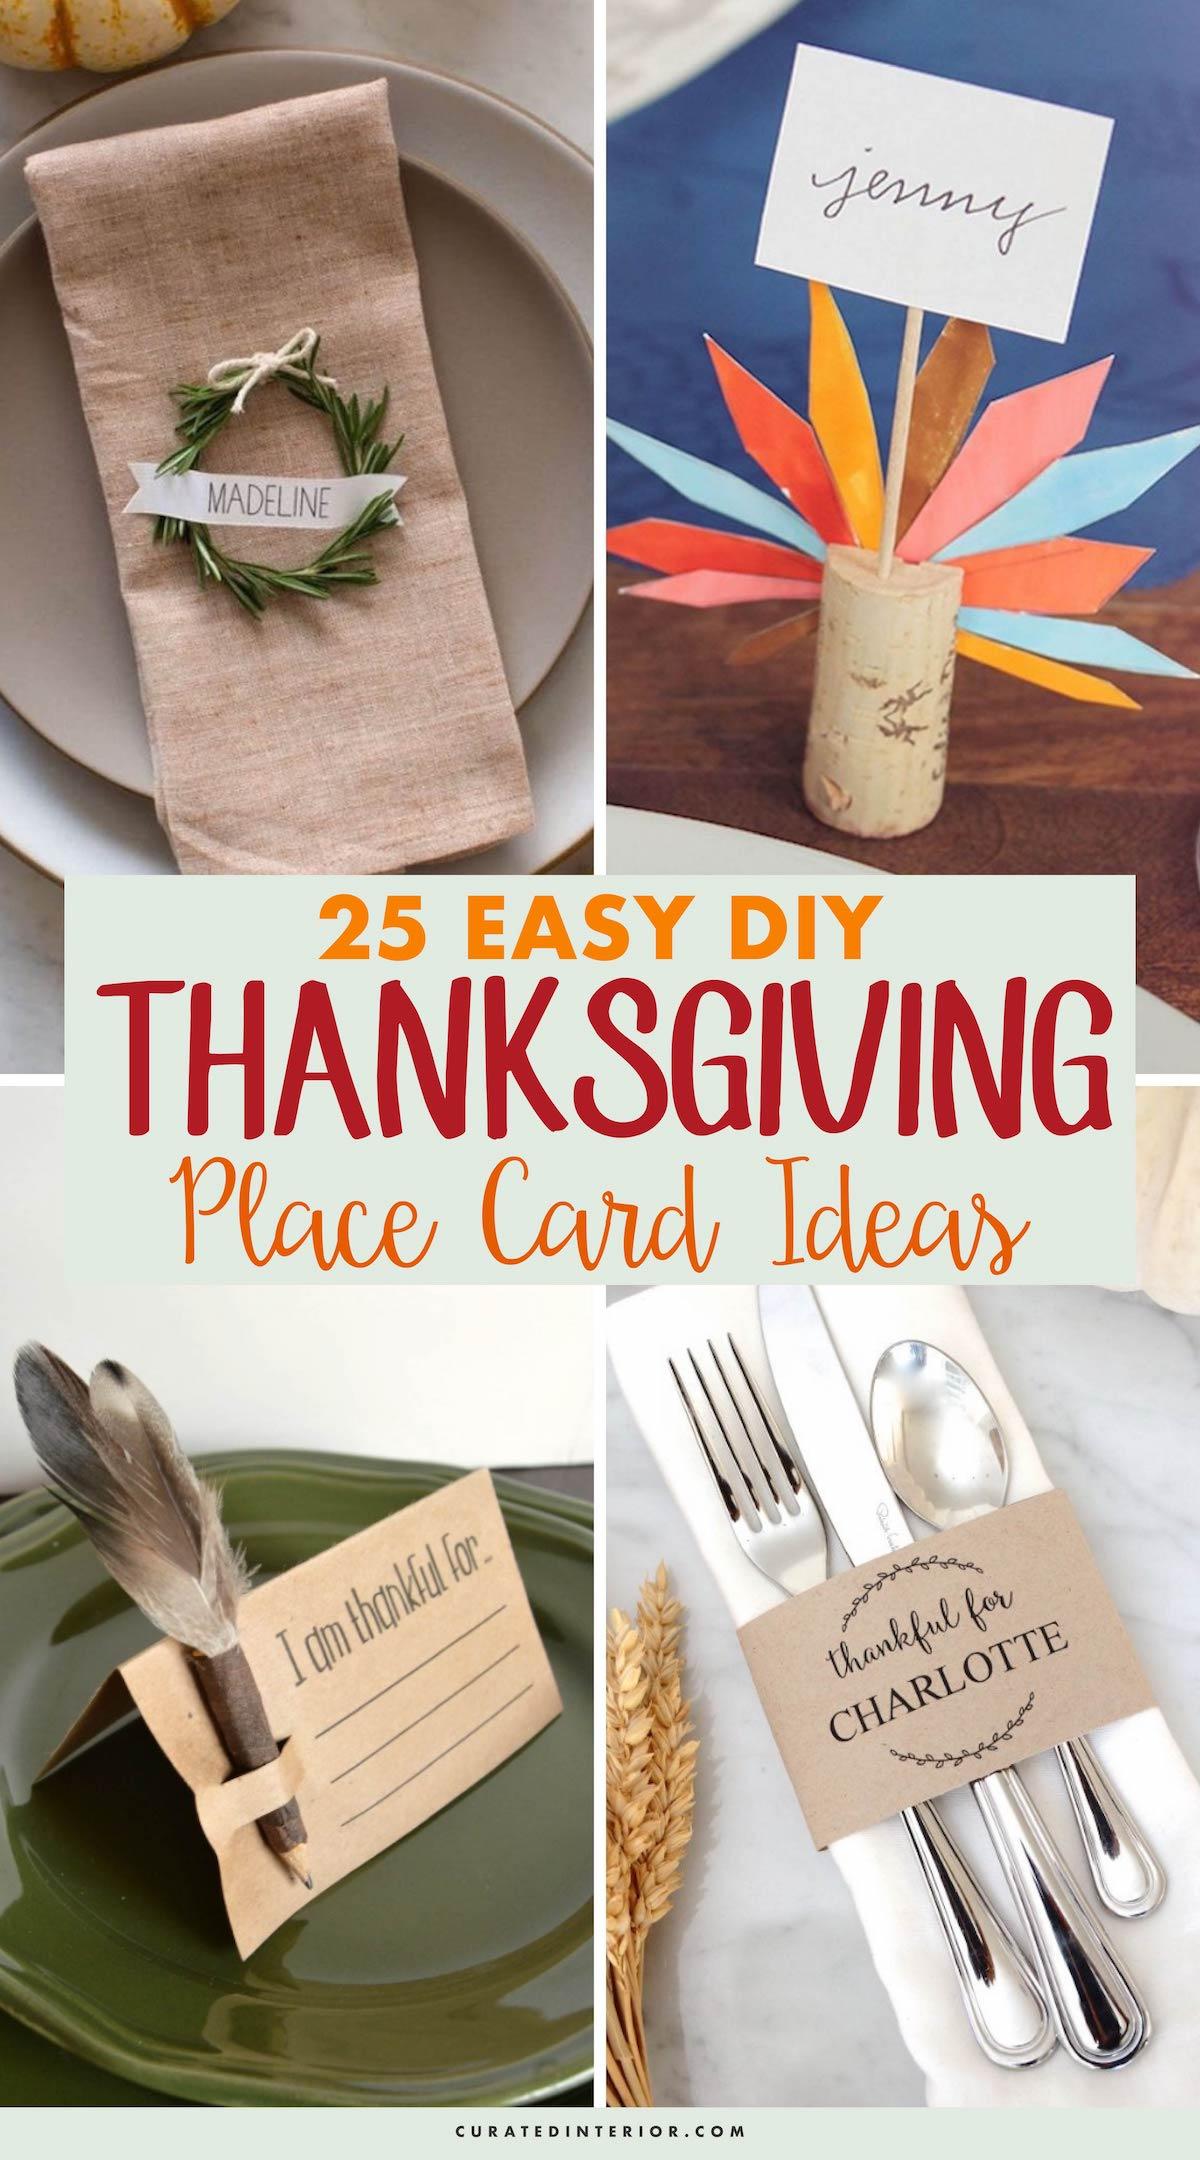 25 Easy DIY Thanksgiving Place Card Ideas #Thanksgiving #ThanksgivingDecor #ThanksgivingTable #ThanksgivingTableDecor